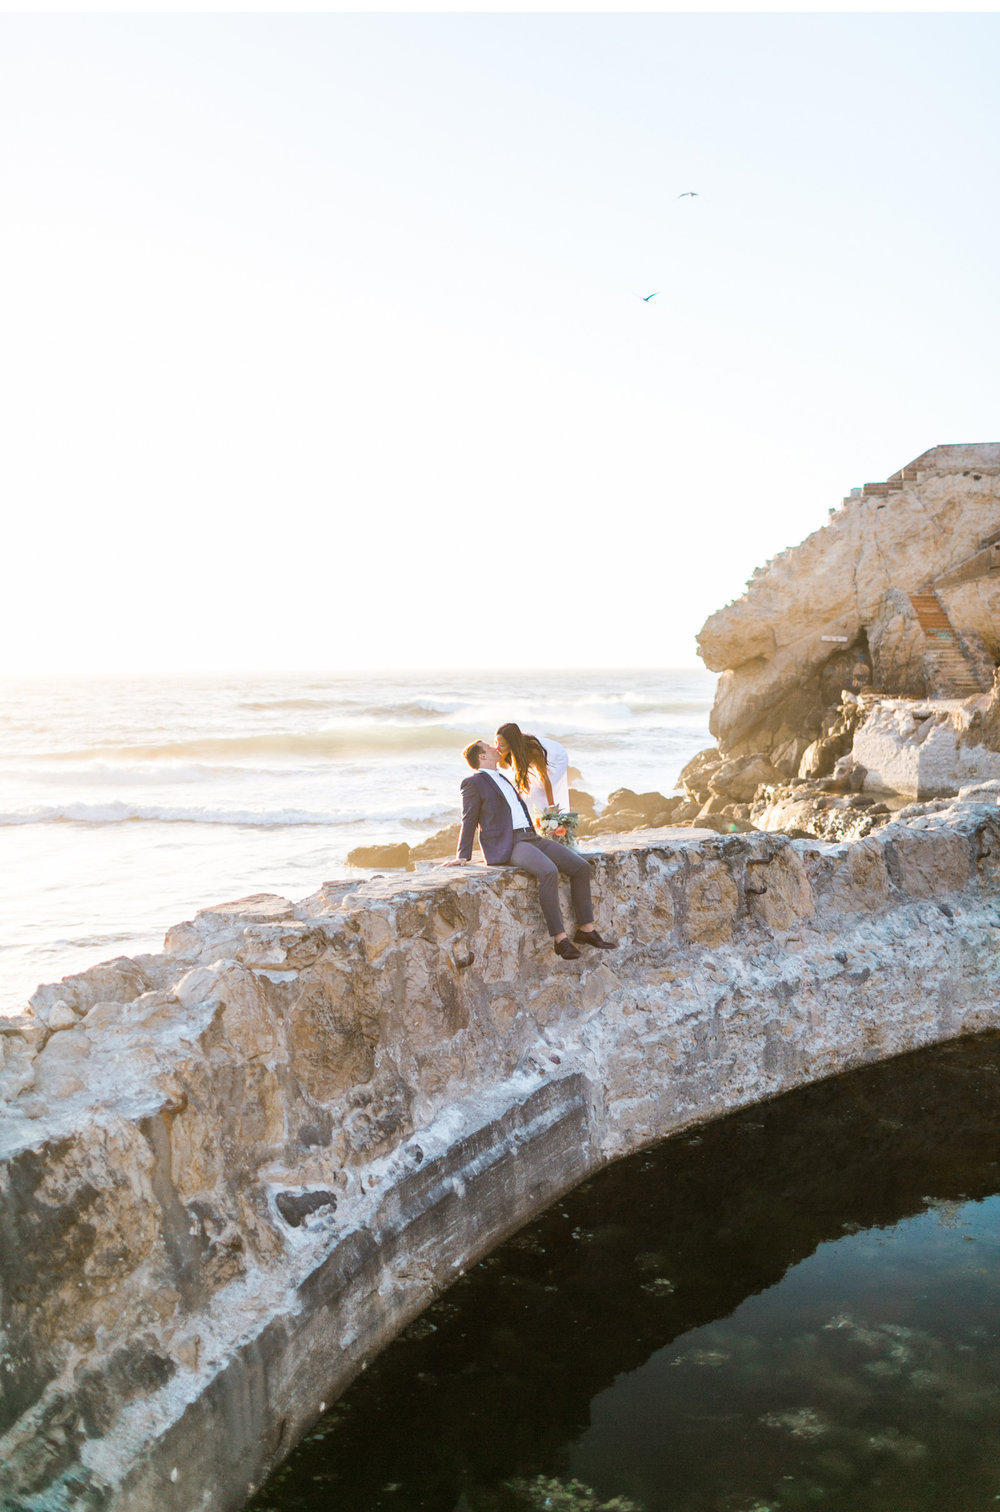 Sutro-Baths-Engagement-Natalie-Schutt-Photography-Style-Me-Pretty_15.jpg